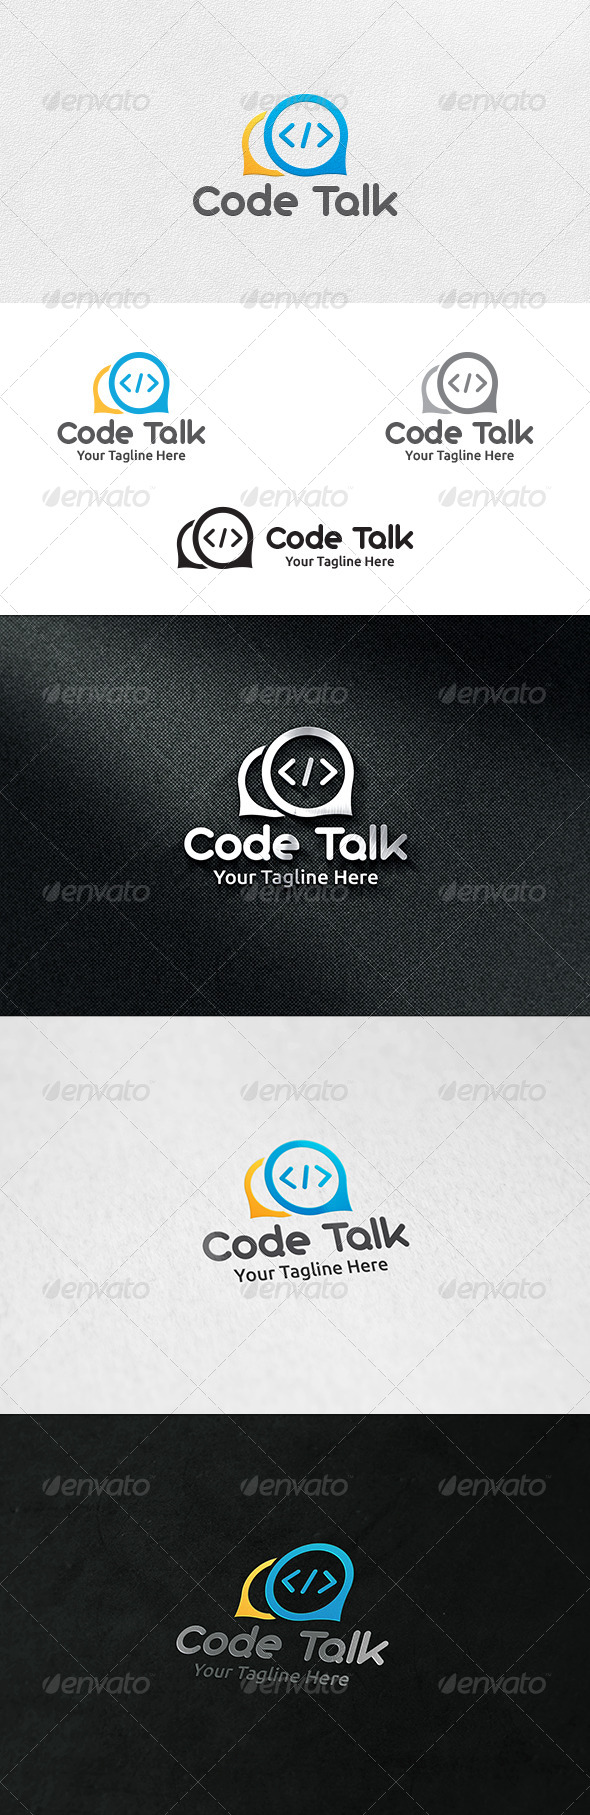 Code Talk - Logo Template